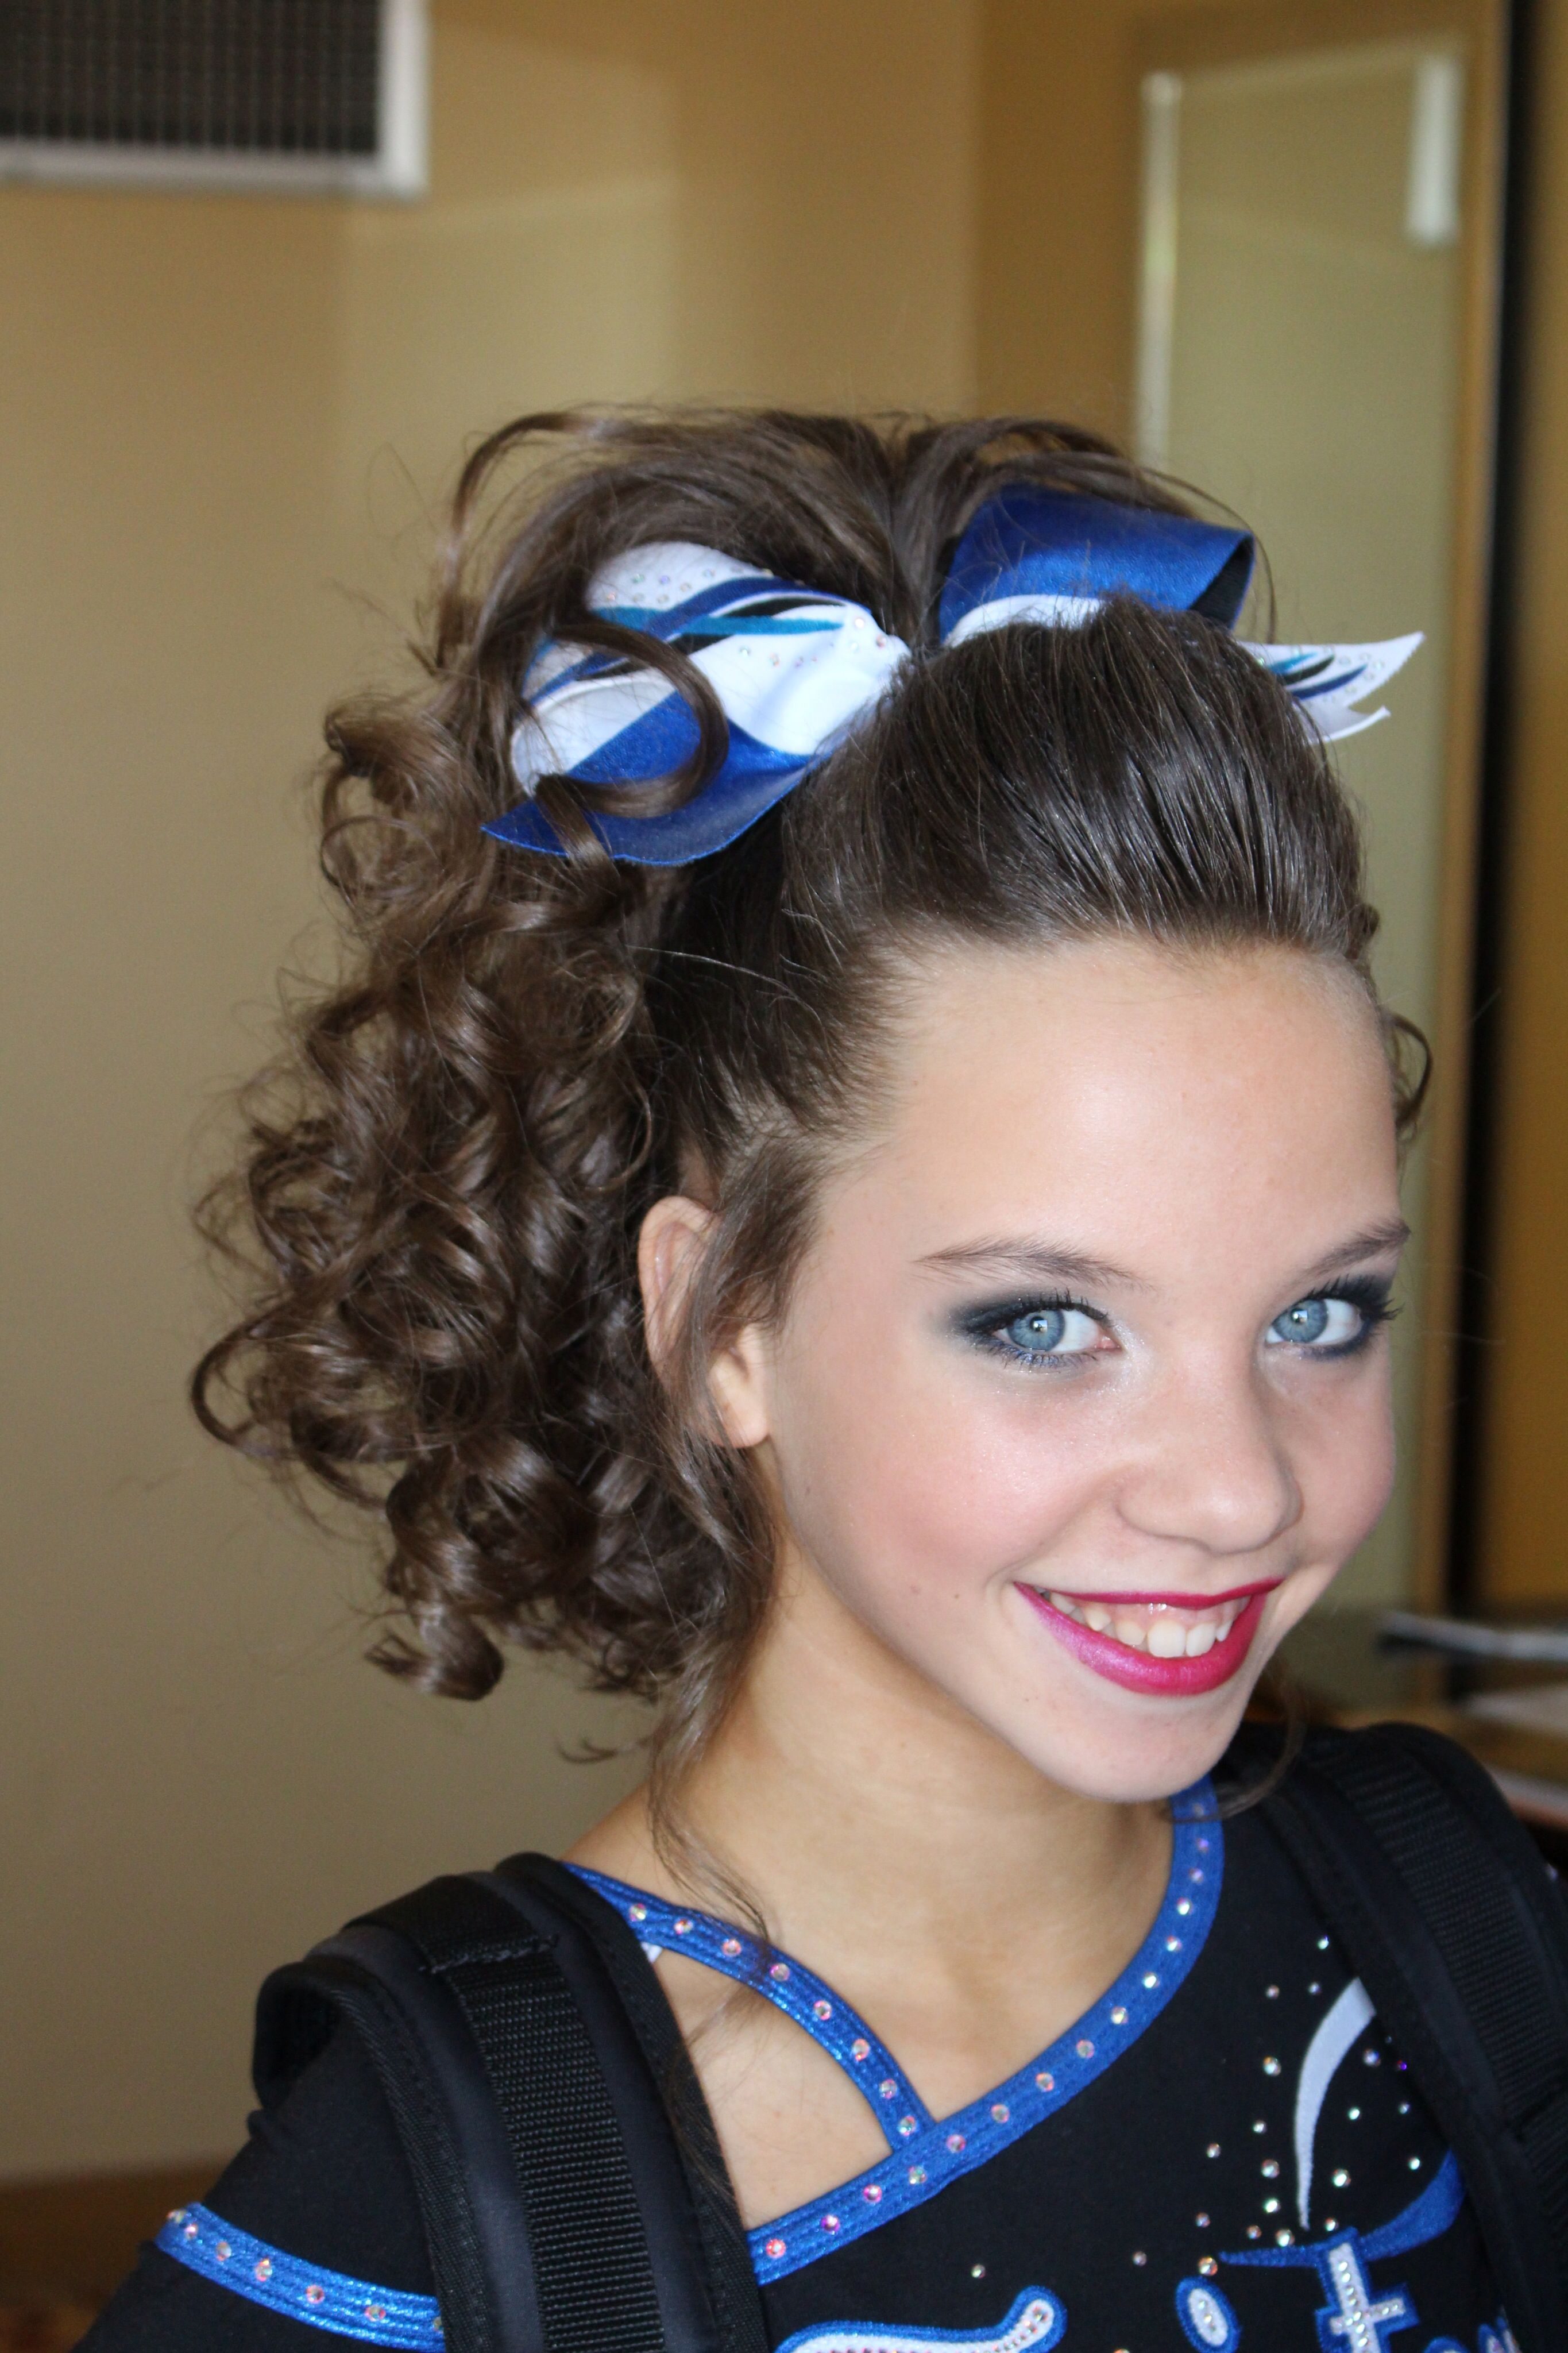 Cheer Hair Cheer hair, Cheer hair bows, Cheer makeup